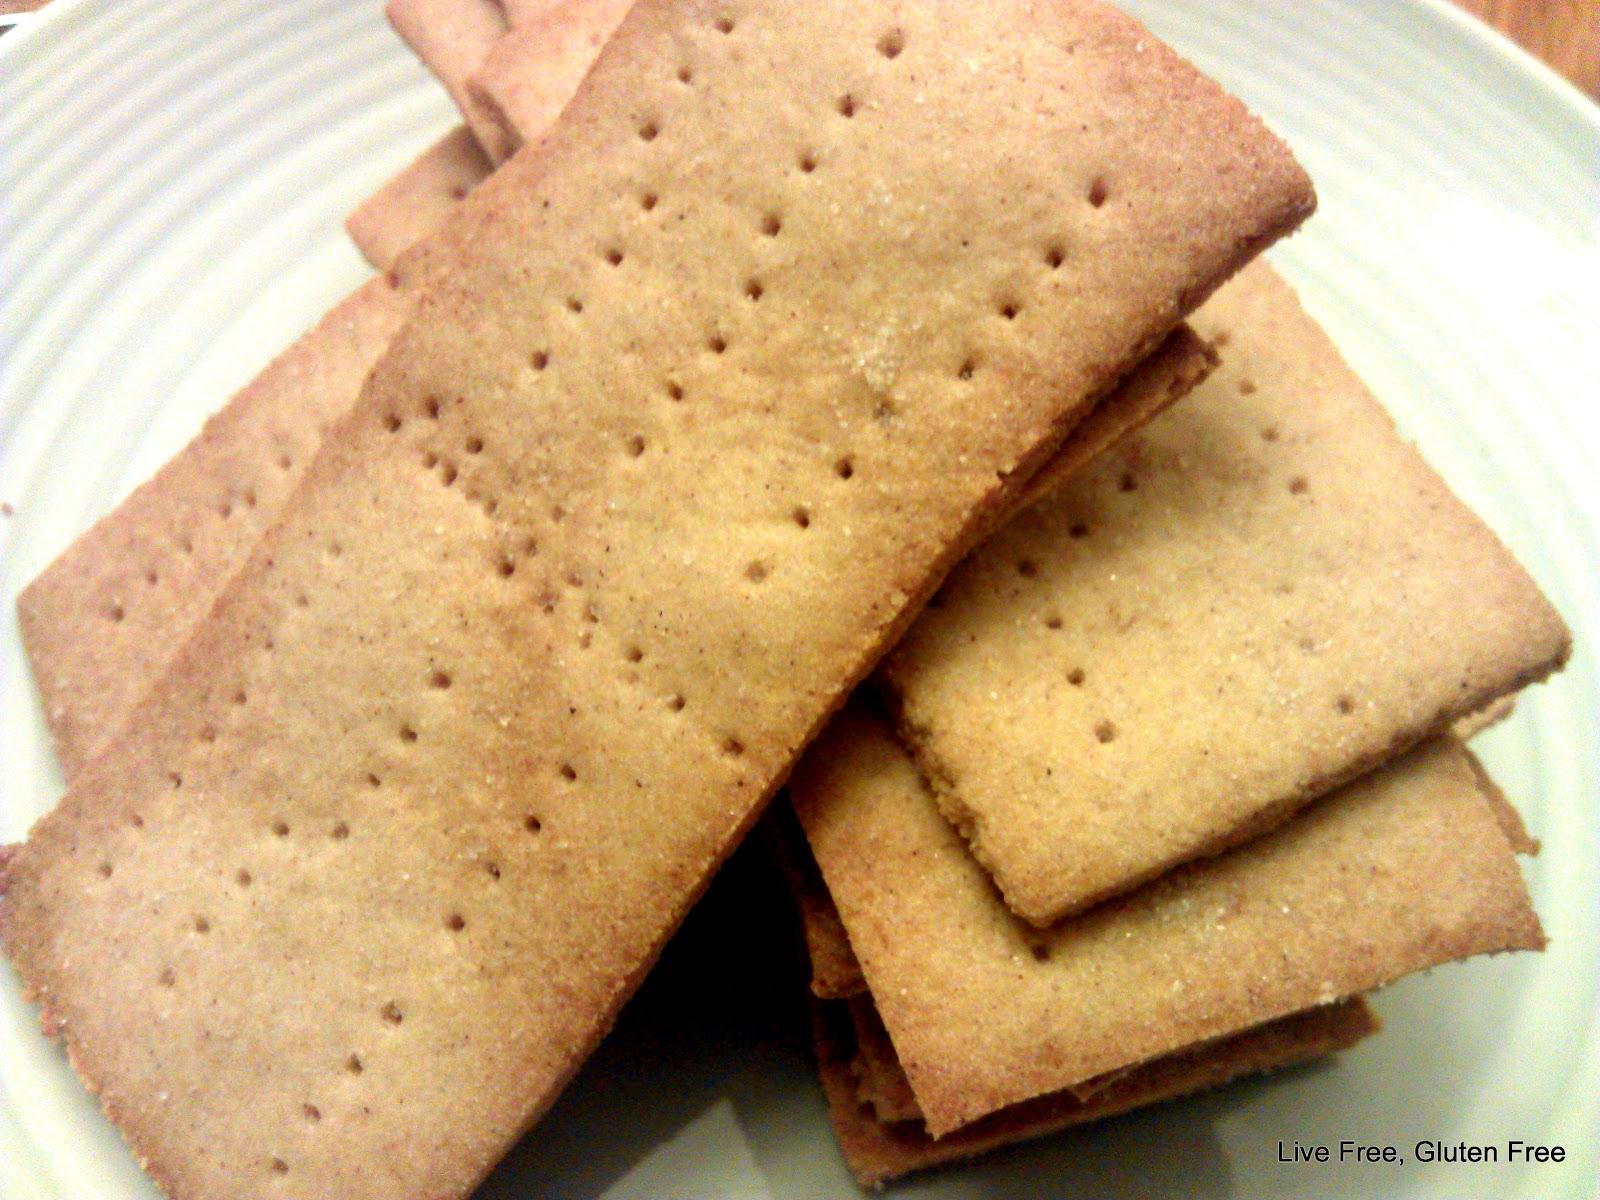 Live Free, Gluten Free: Graham Crackers